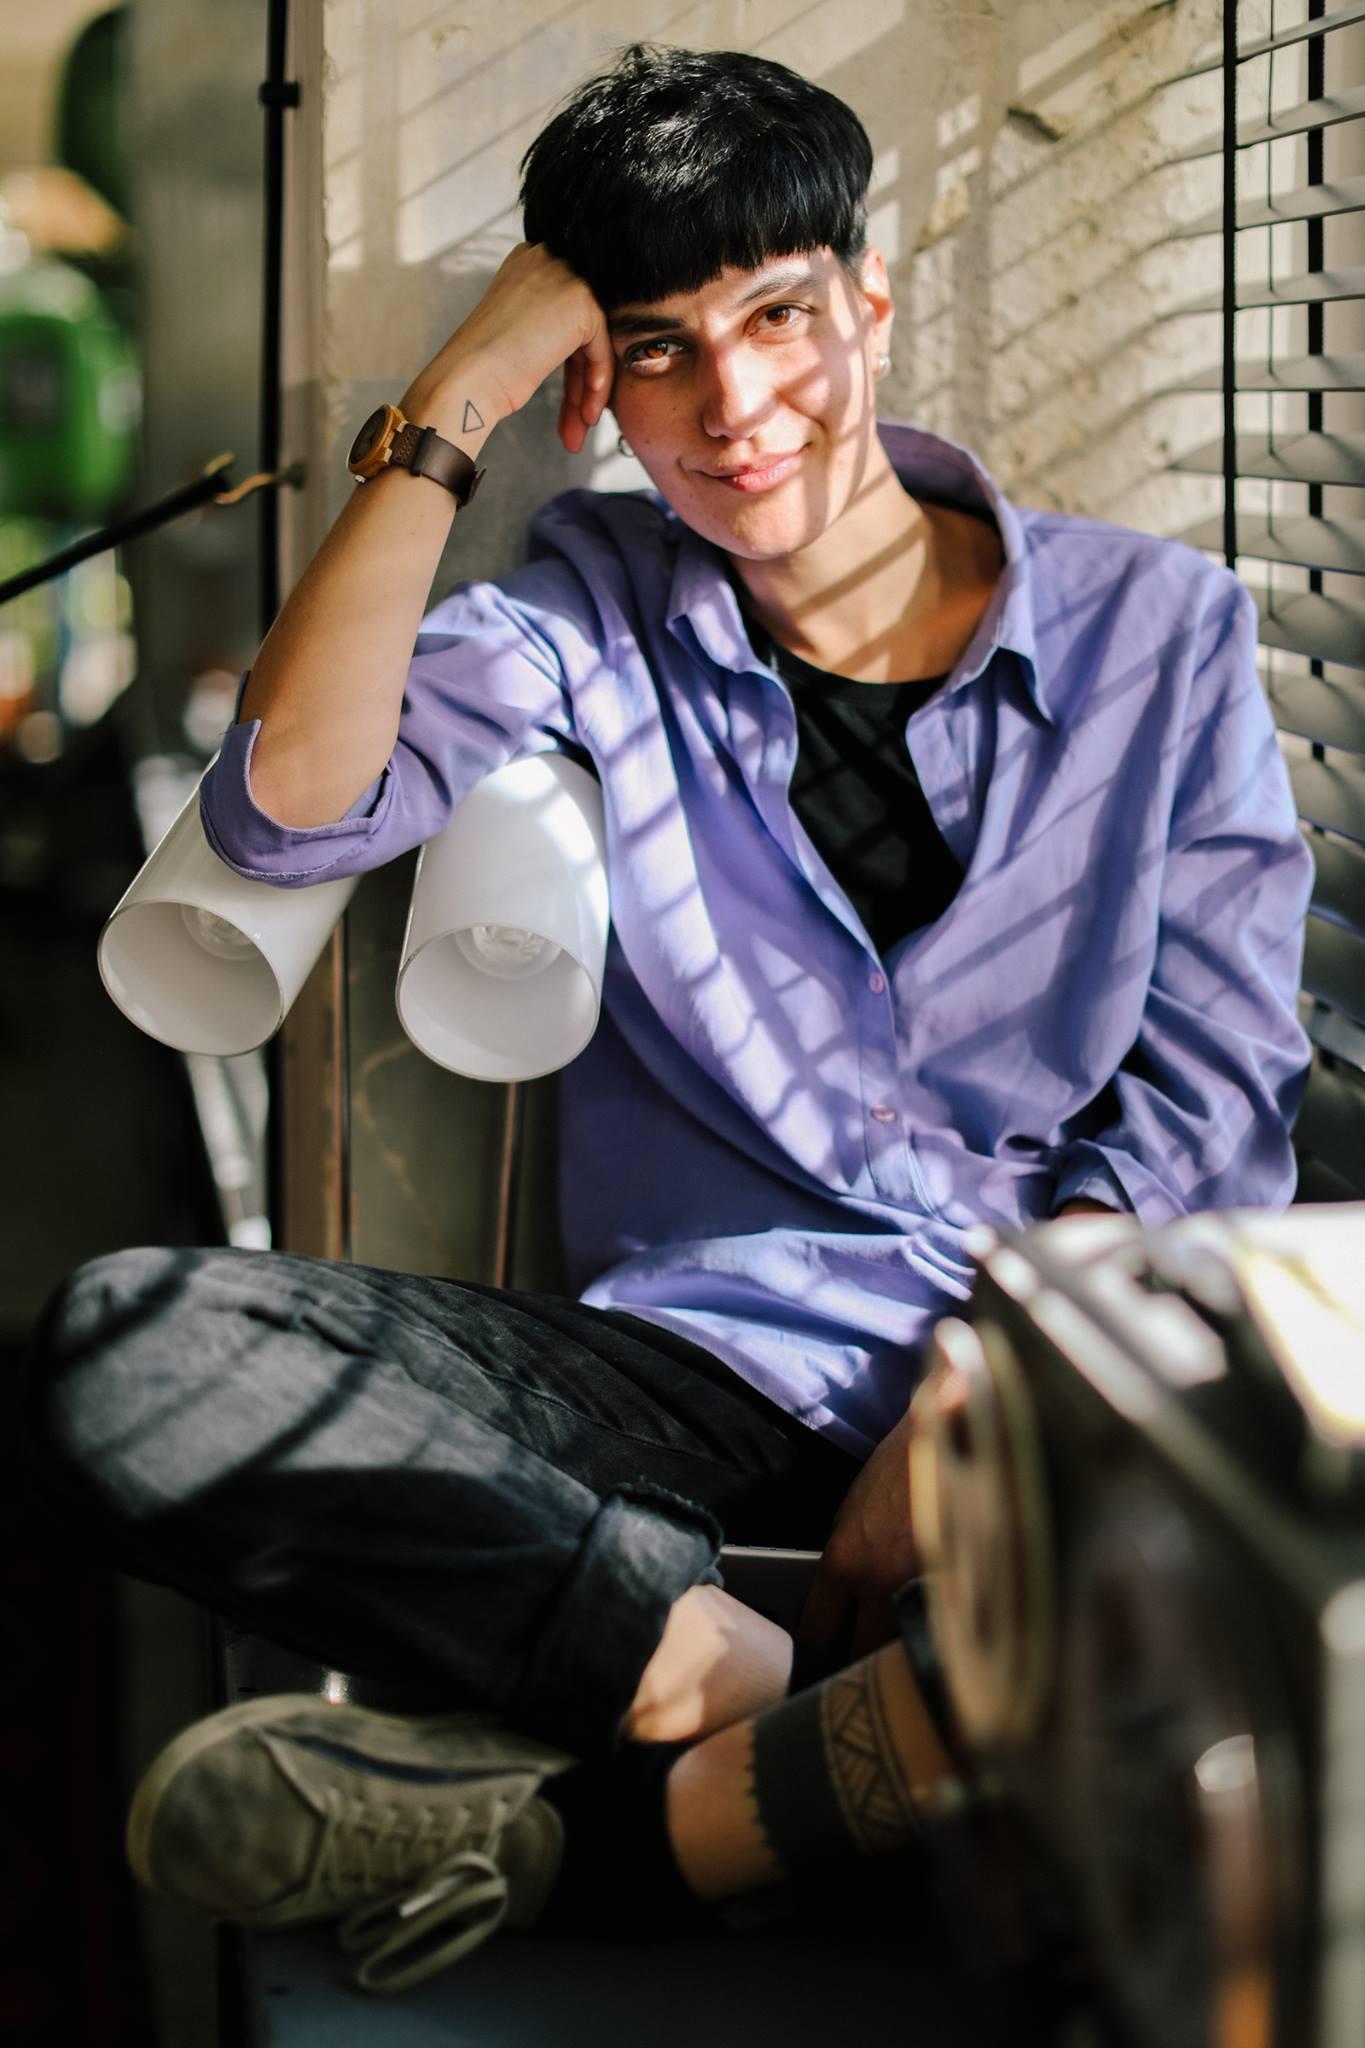 Ana Svanidze Fabrika Hostel & Suites / Manager